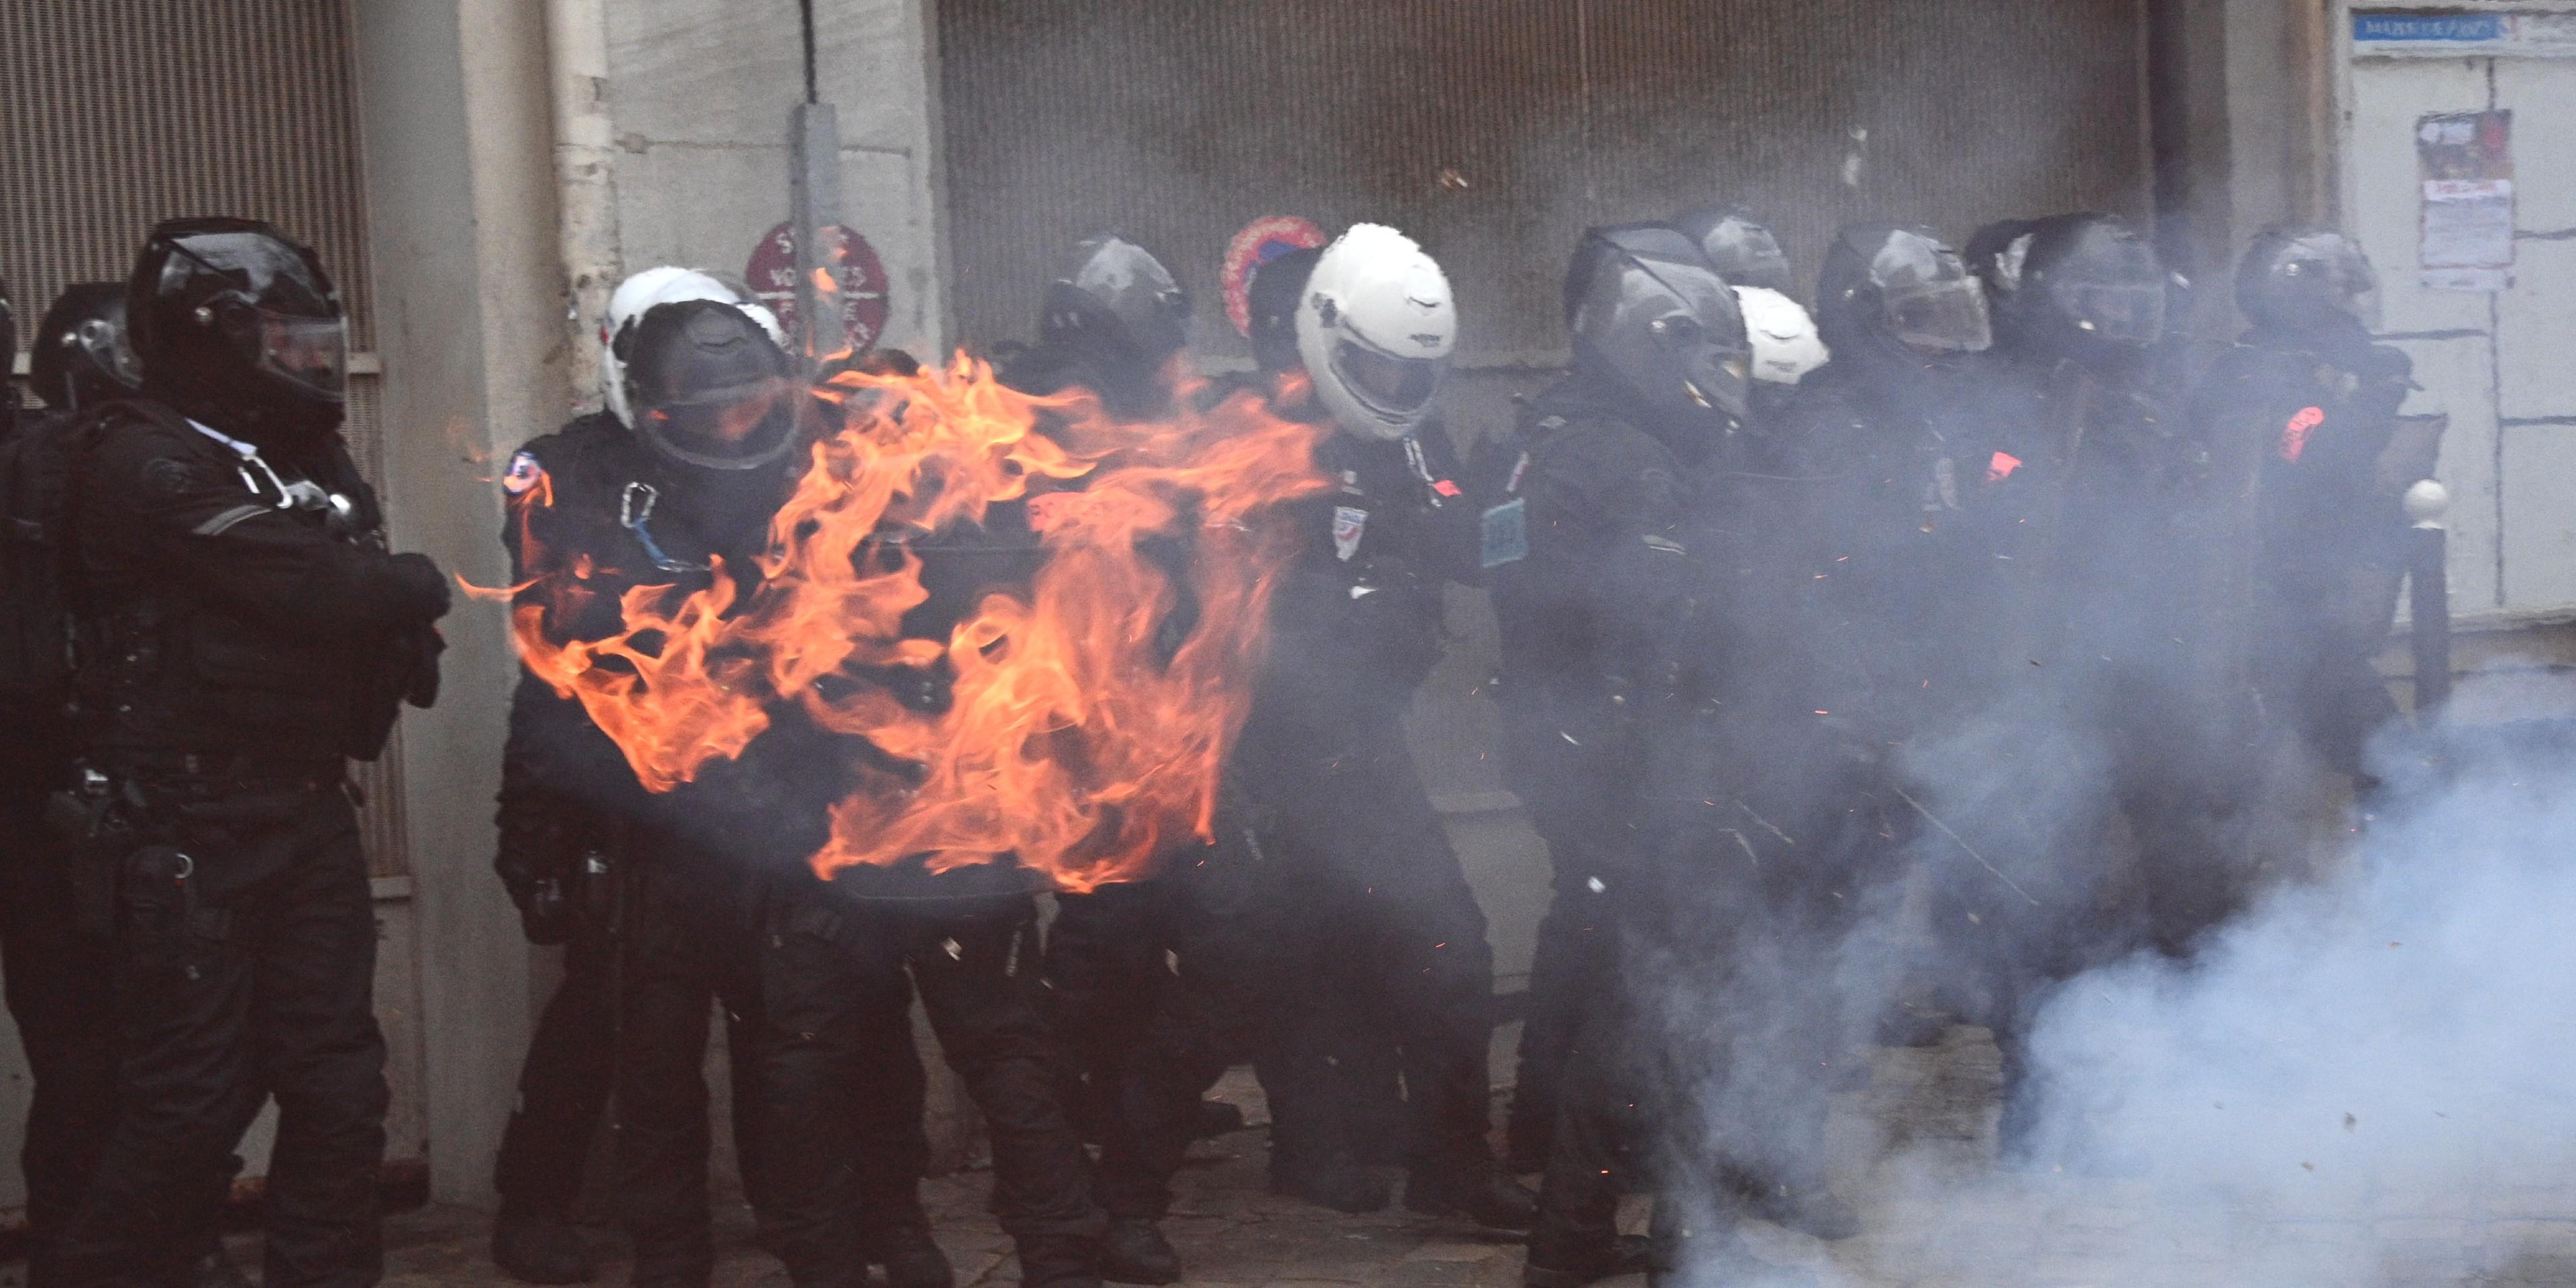 Securite Globale 52 350 Manifestants En France Selon Le Ministere 64 Interpellations